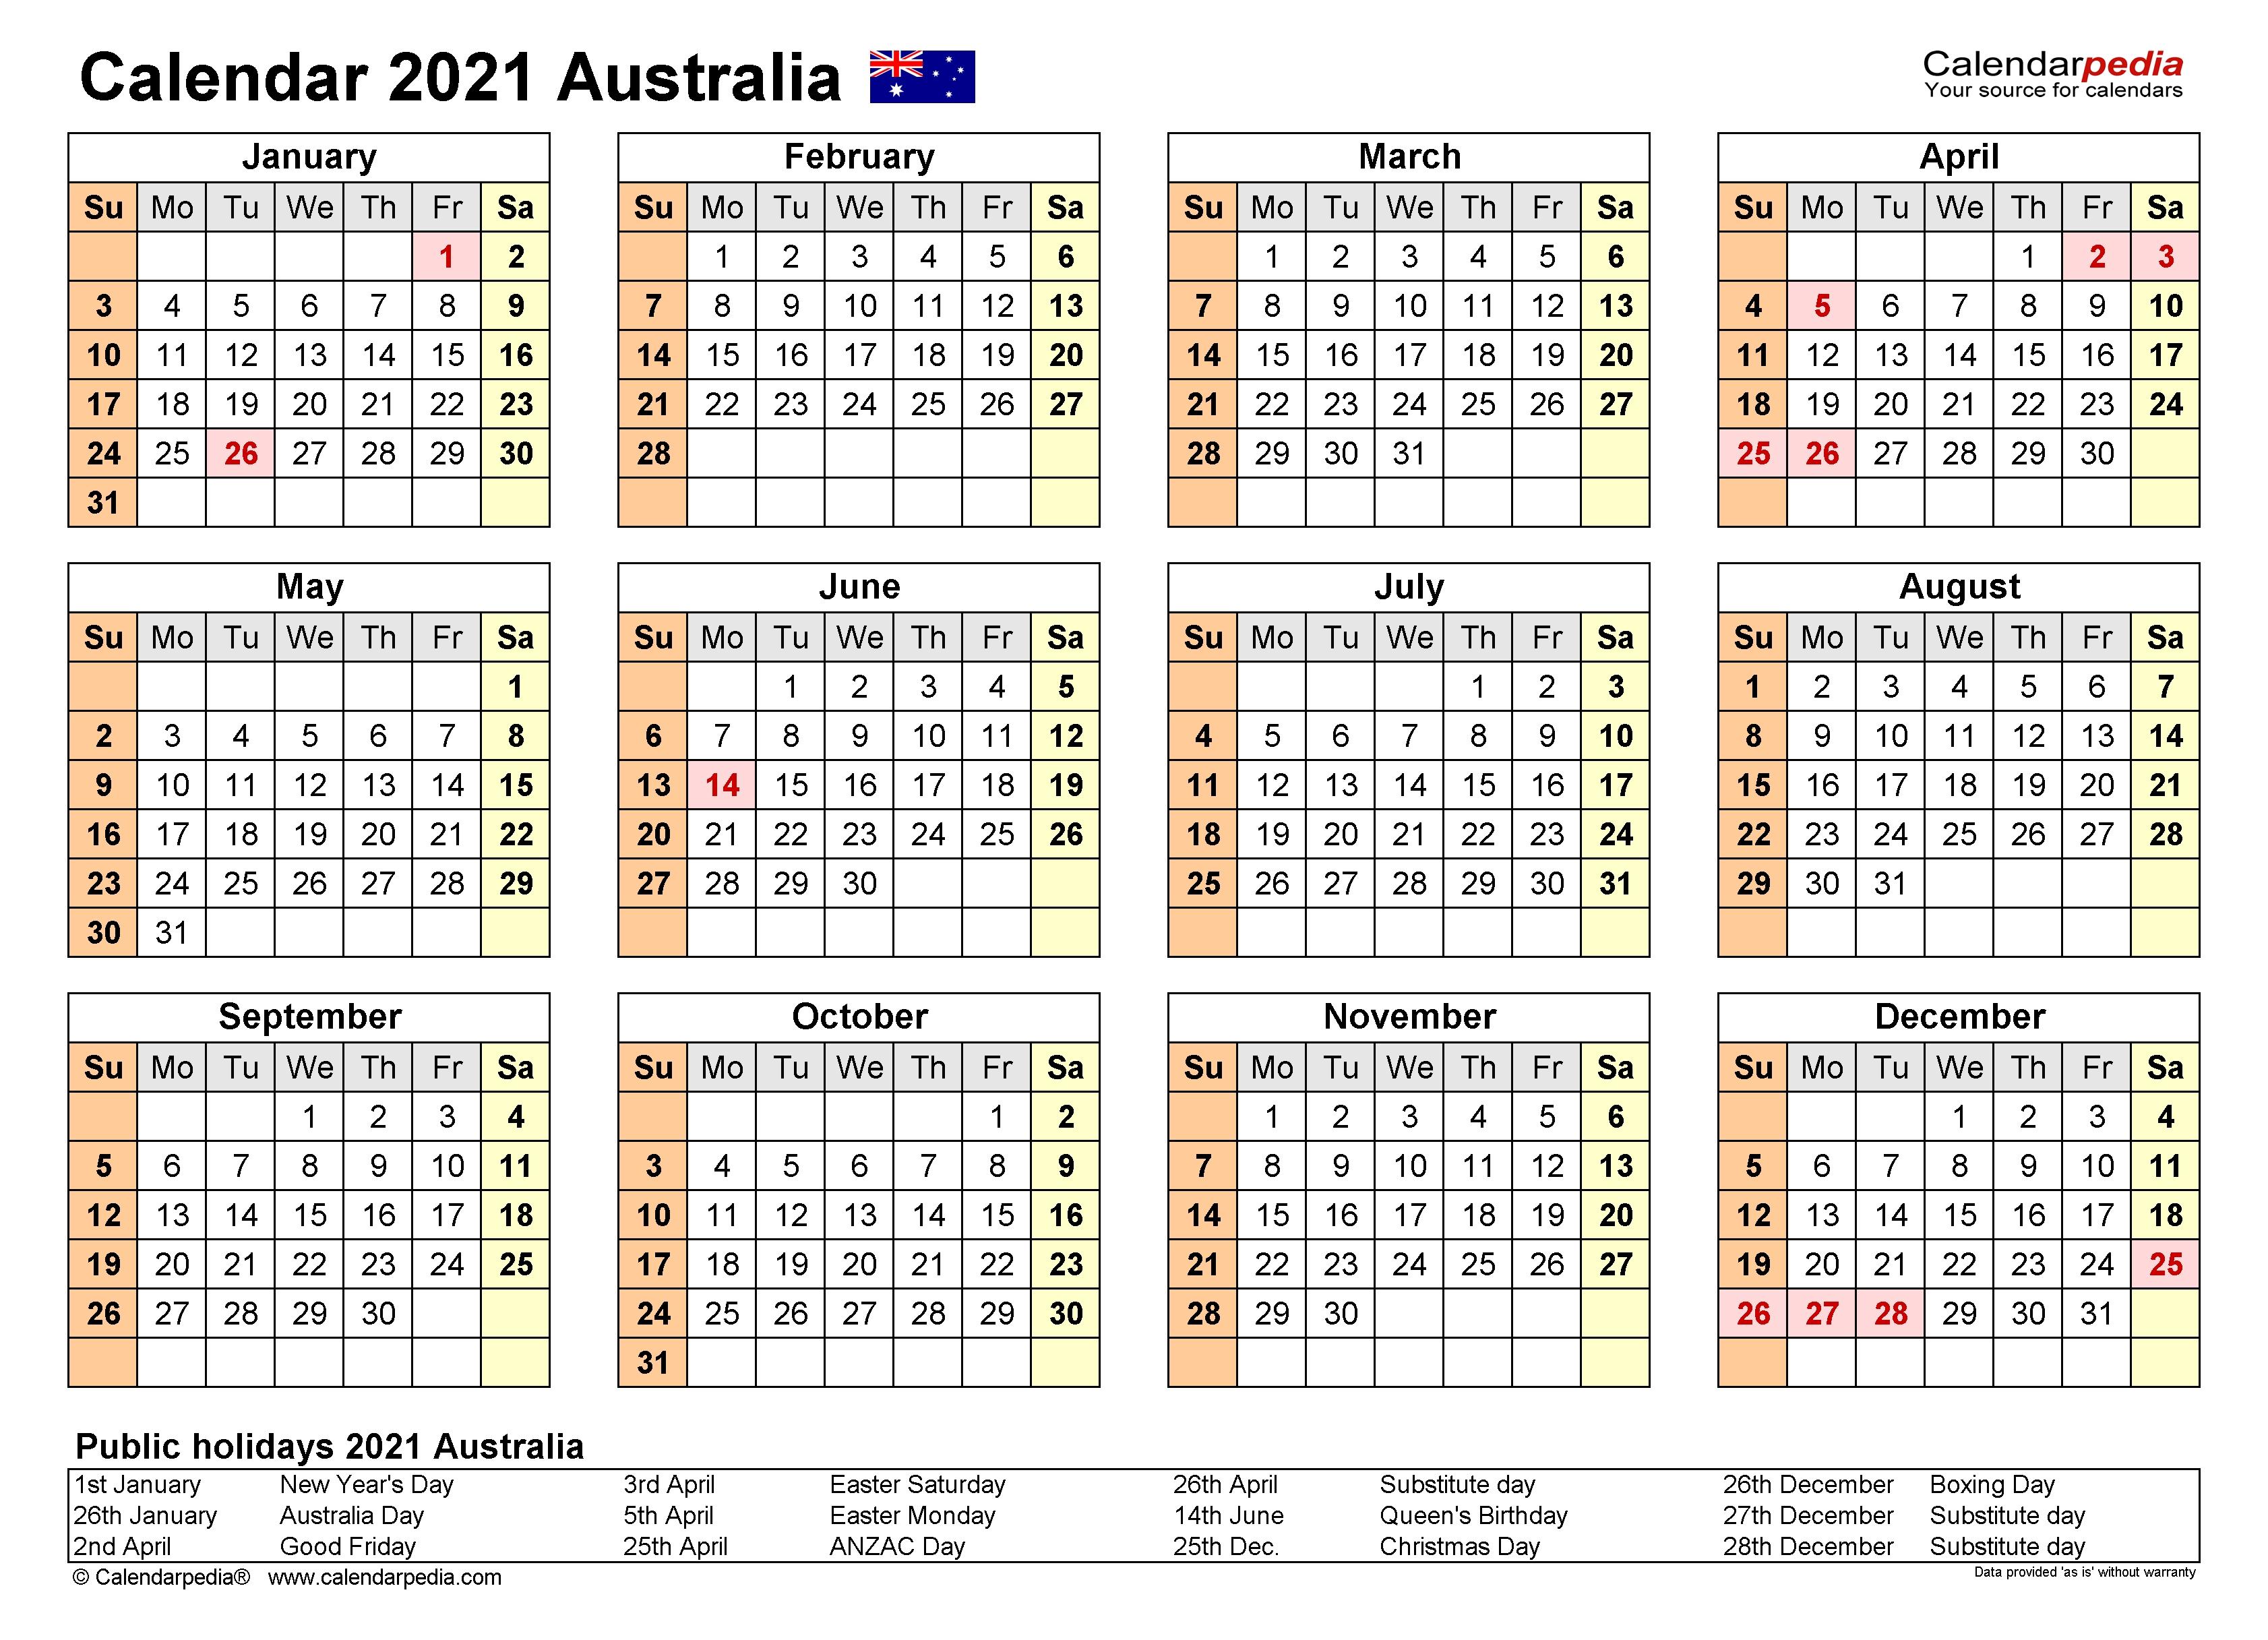 Australia Calendar 2021 - Free Printable Excel Templates  Financial Year Calendar 2021 19 Australia